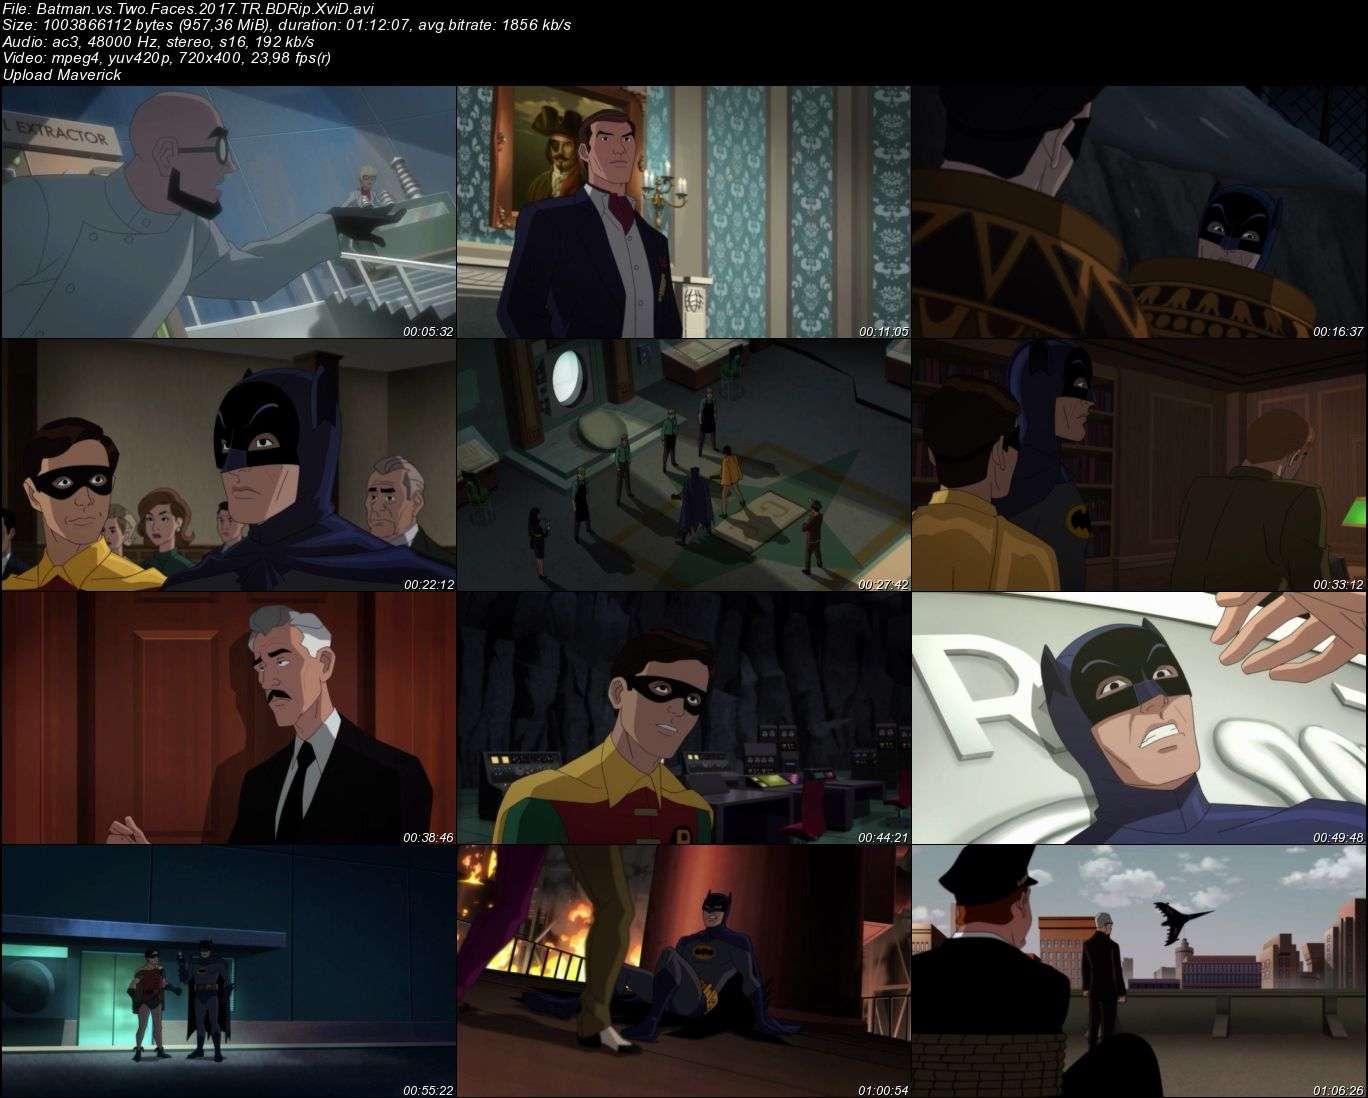 Batman İki Yüz'e Karşı - 2017 Türkçe Dublaj BDRip XviD indir